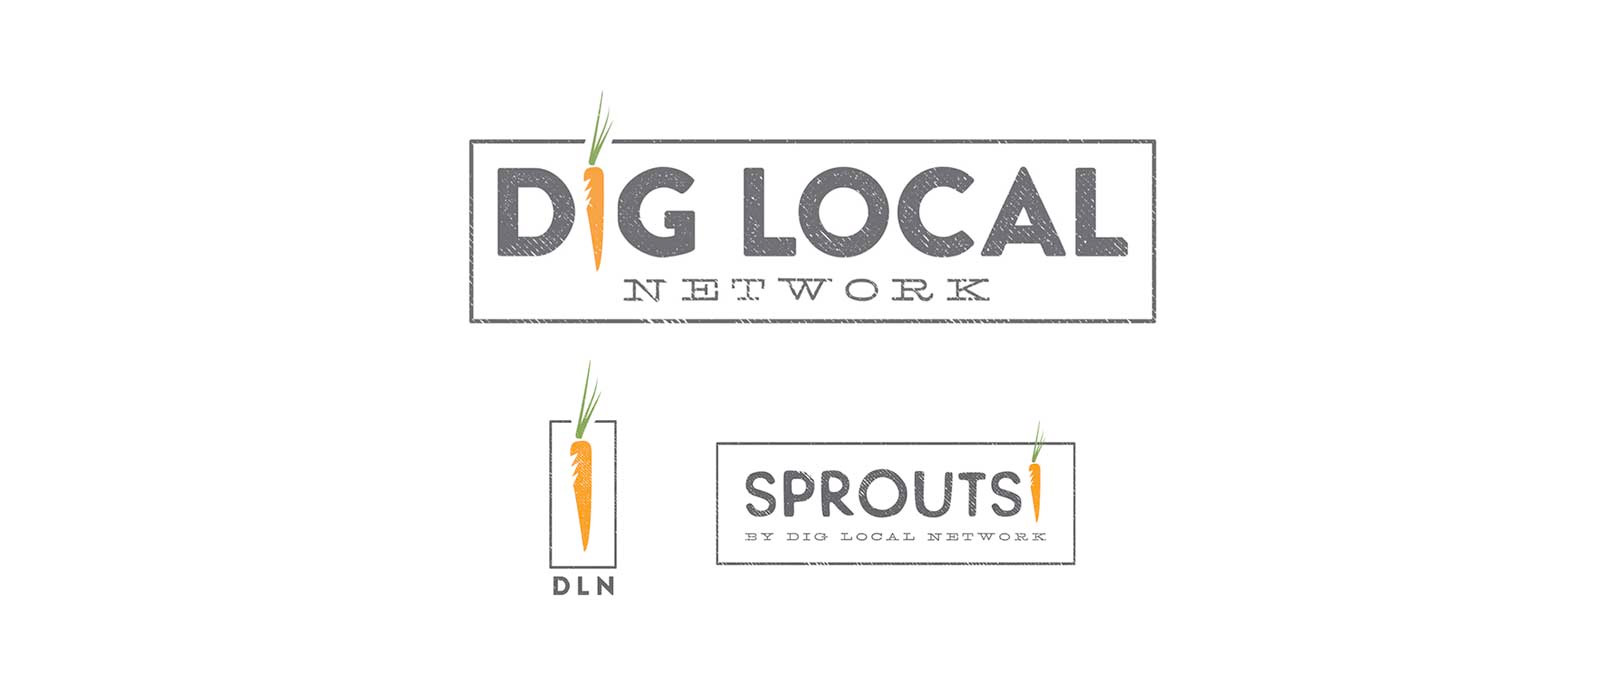 Dig Local Network graphic design logo design branding